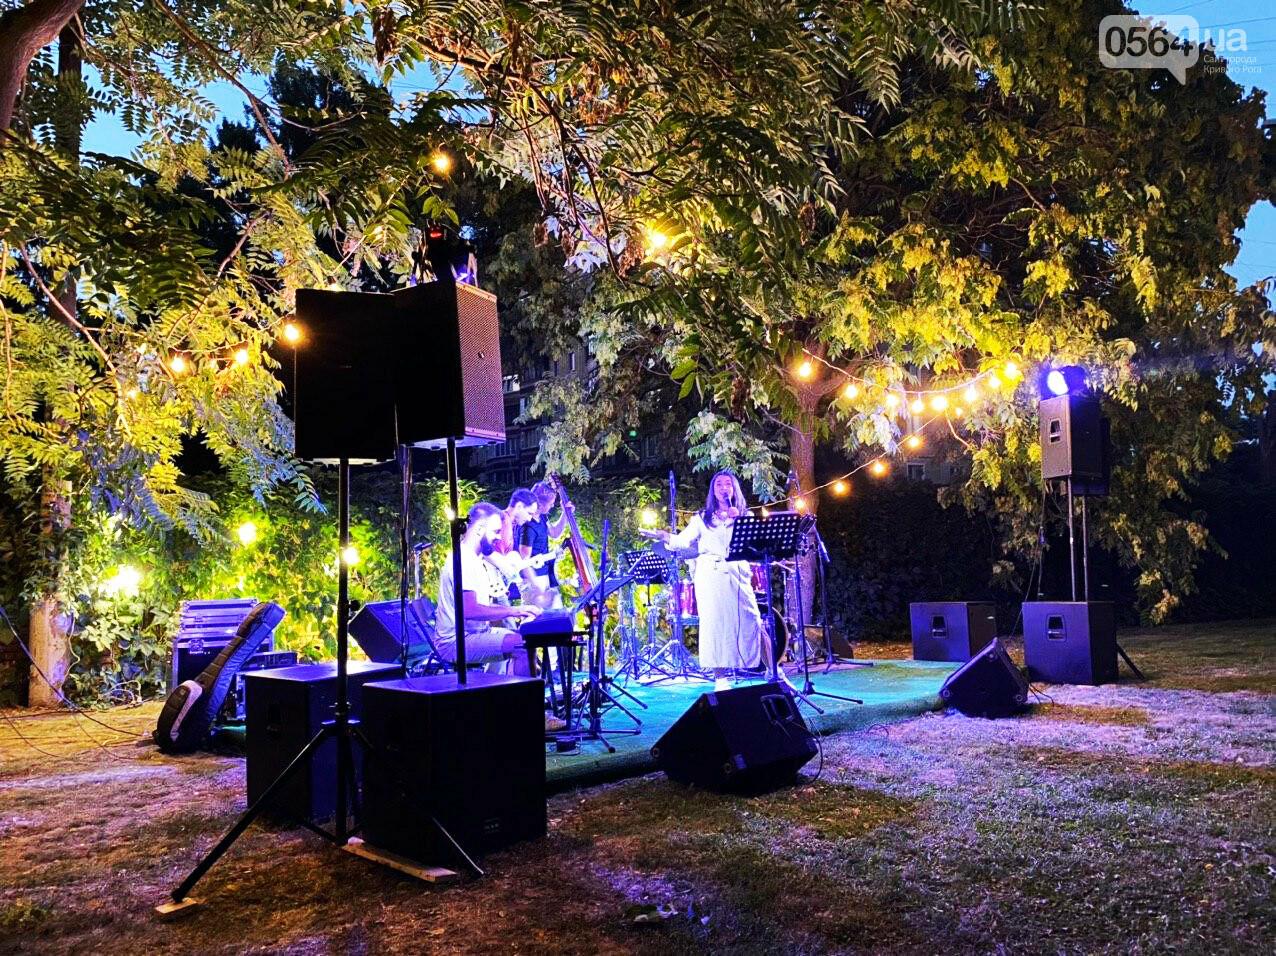 Под звездным небом криворожане наслаждались летним джазом от  Advantage Project, - ФОТО, ВИДЕО , фото-58